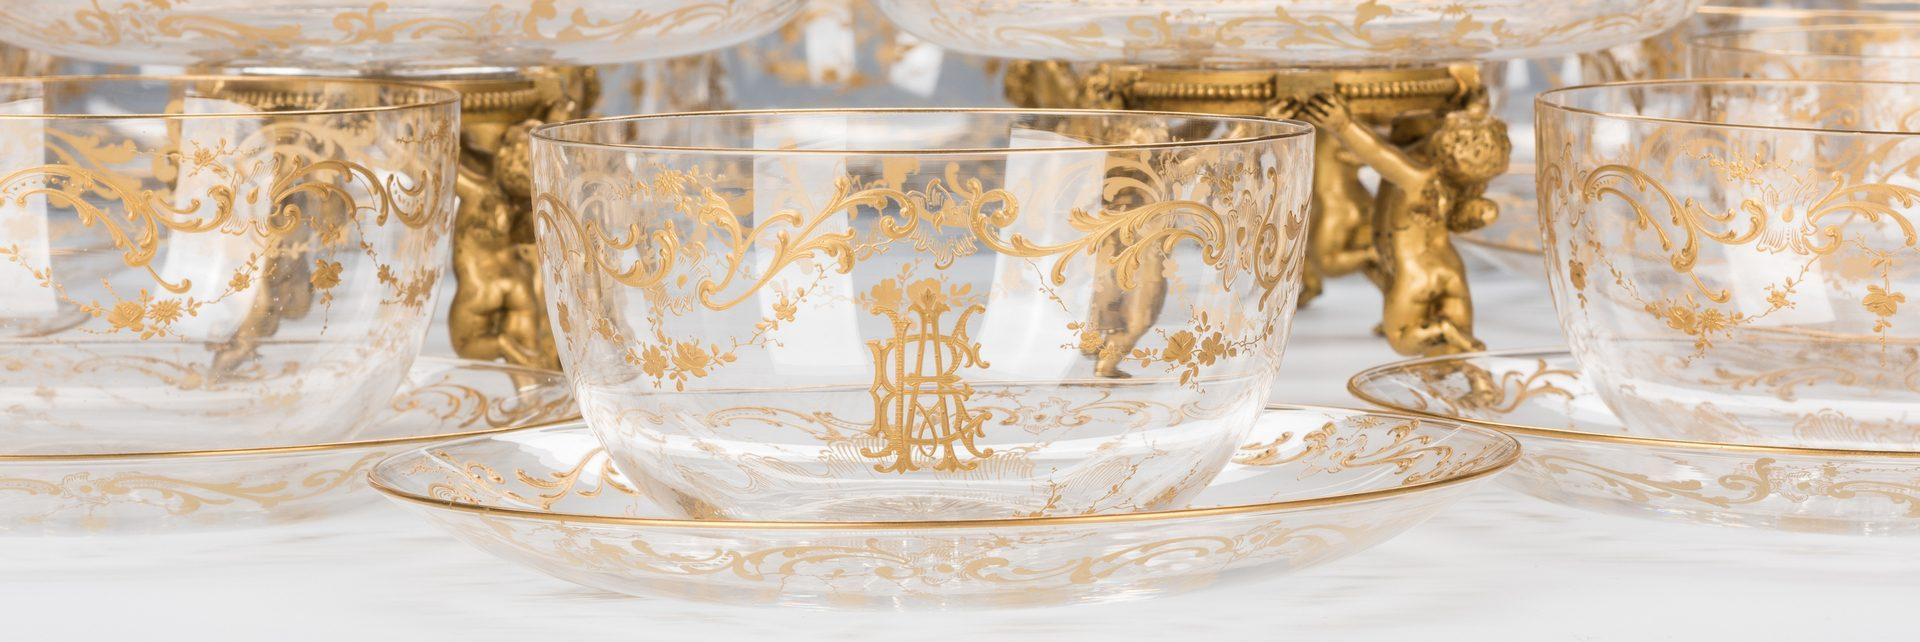 Lot 323: Baccarat Gilded Crystal Bowls & Tazzas